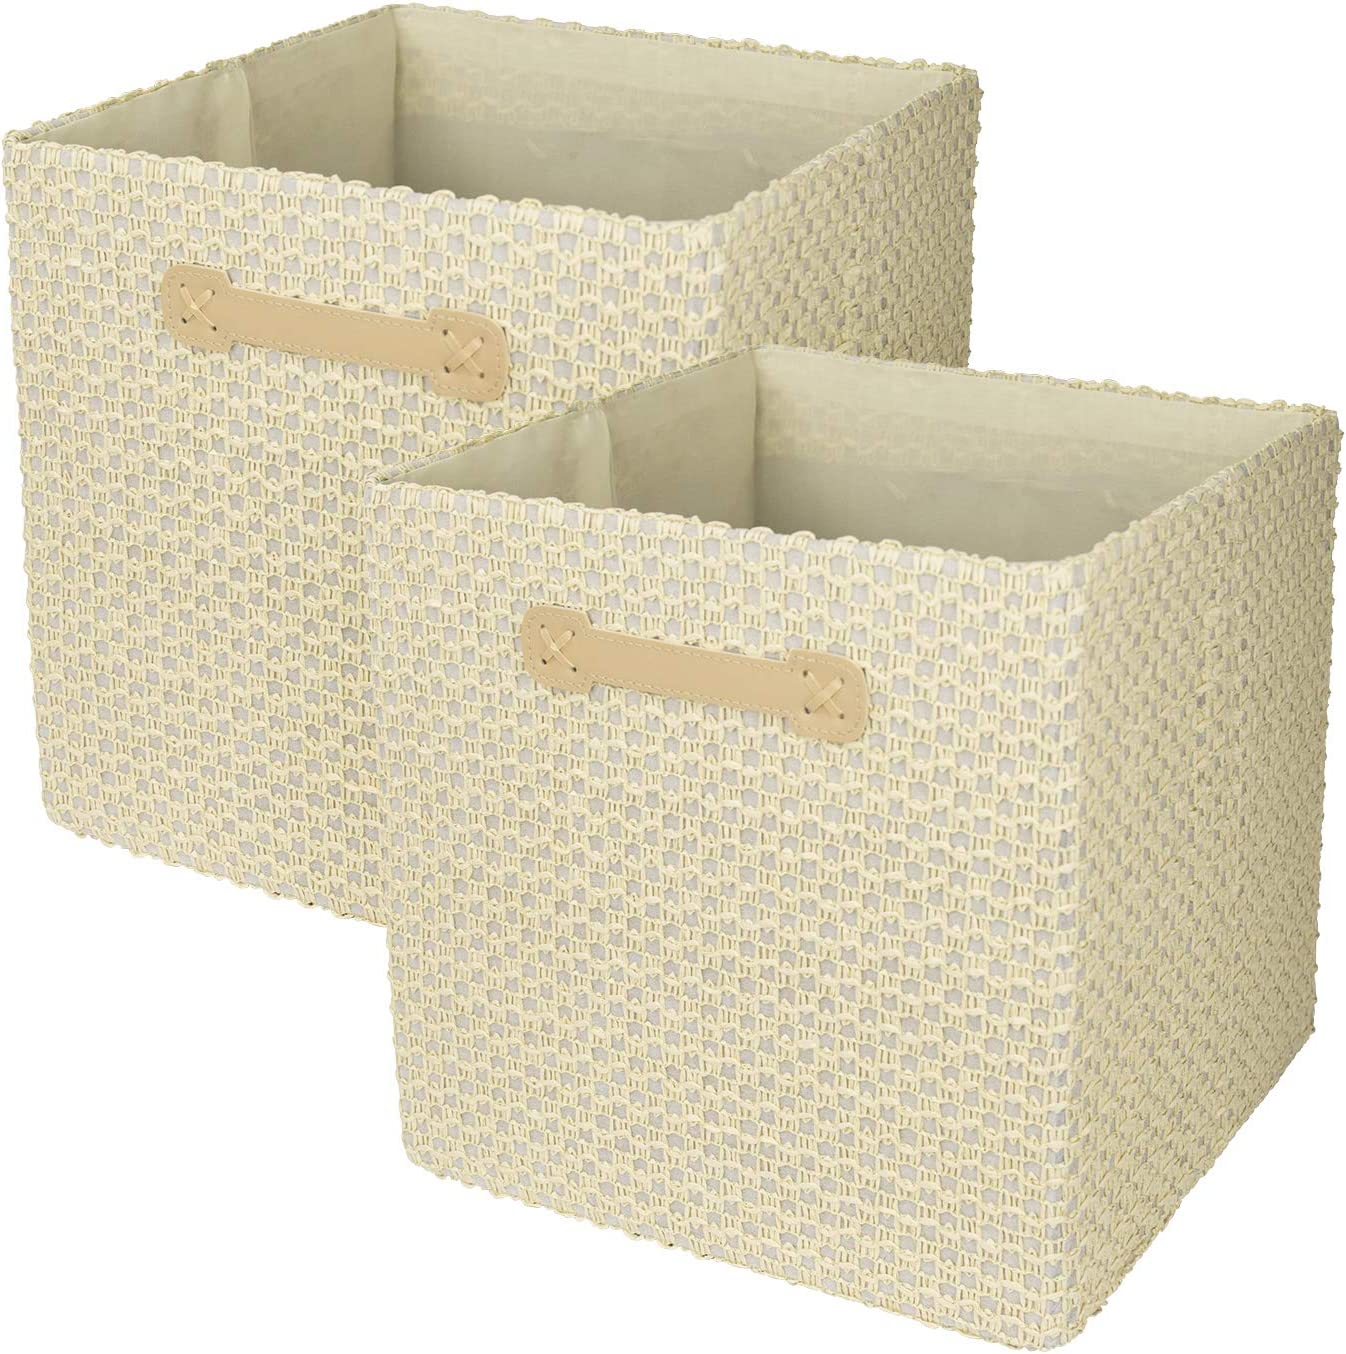 Cesta almacenaje, juego de cajas de almacenaje, cesta toallas baño, organizador armario, 33 * 33cm, Beige, Set 2